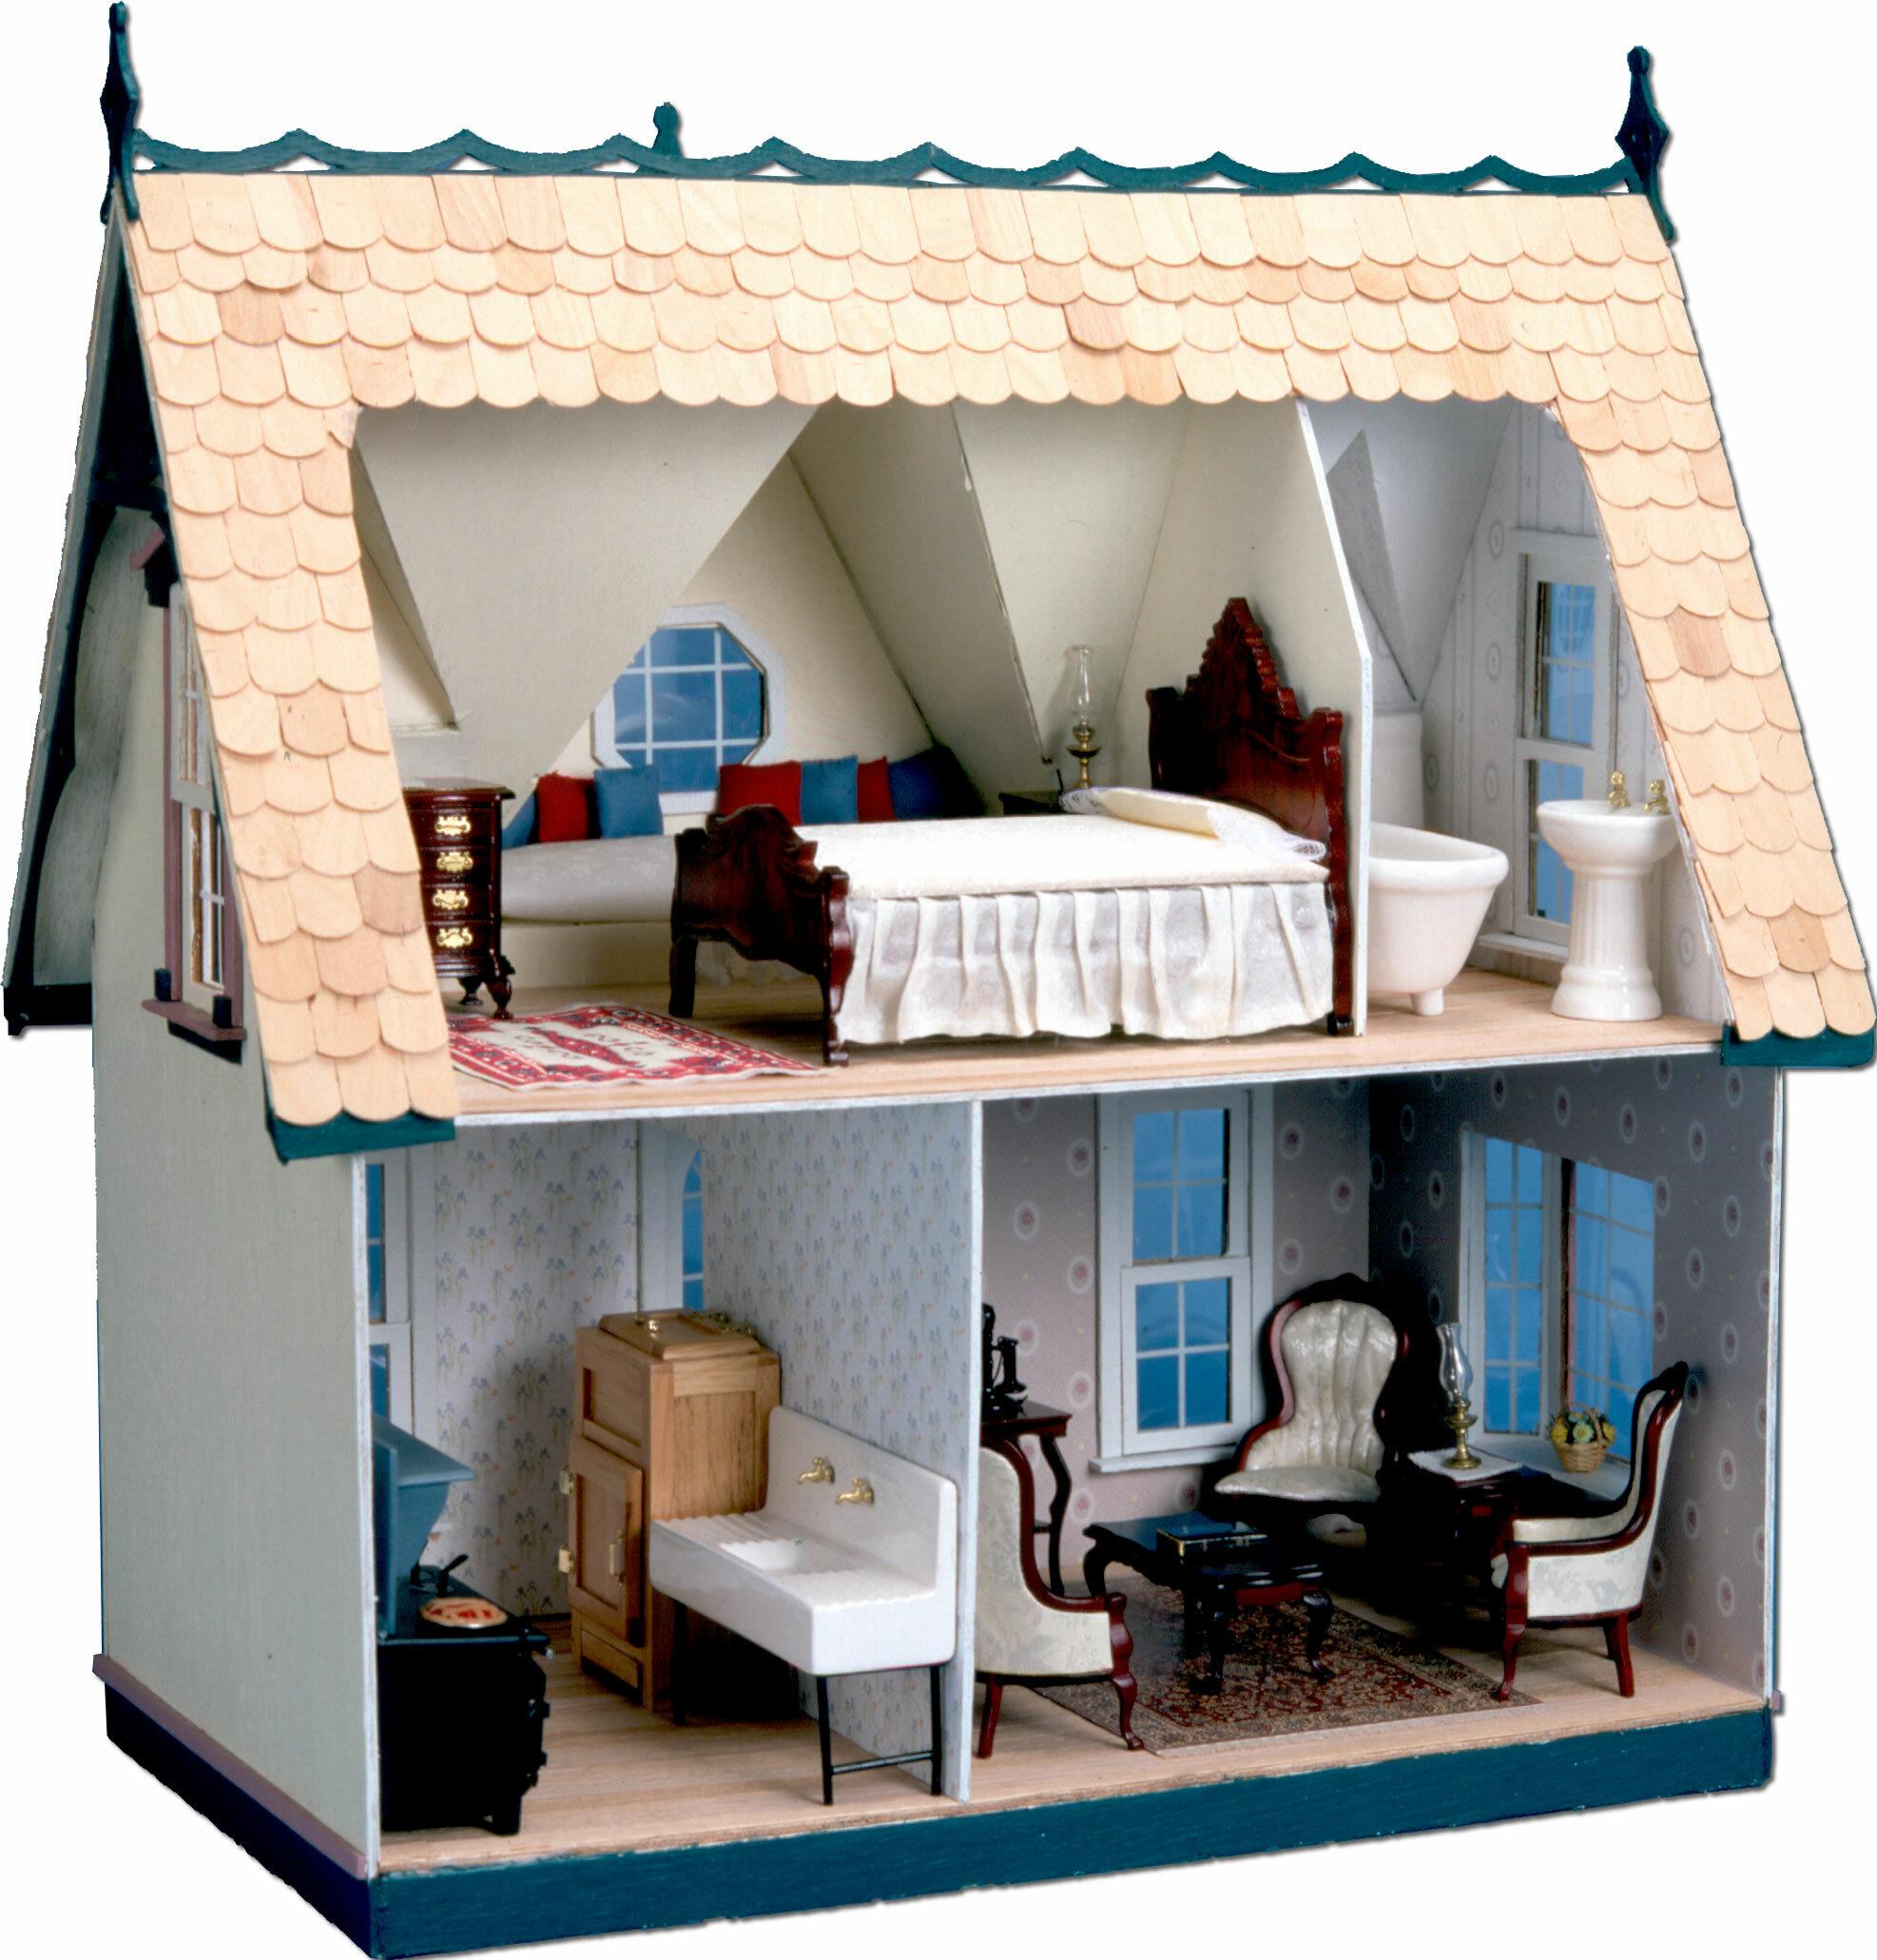 Greenleaf Dollhouses Orchid Dollhouse & Reviews